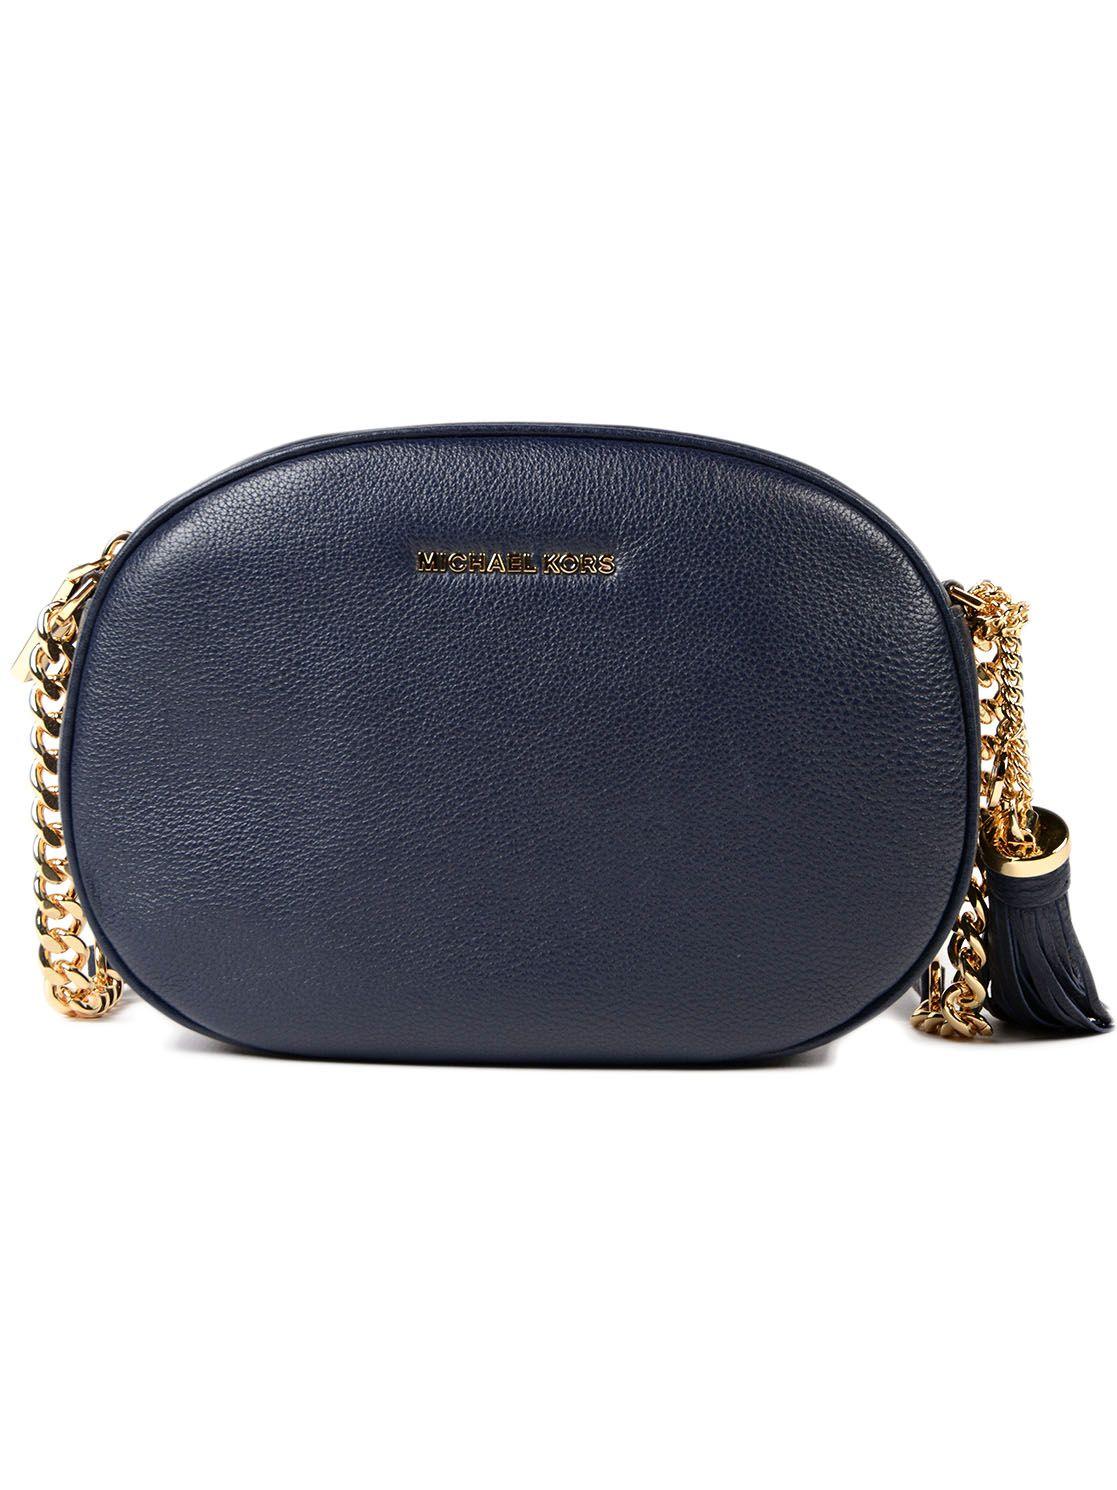 Michael Kors Medium Ginny Shoulder Bag